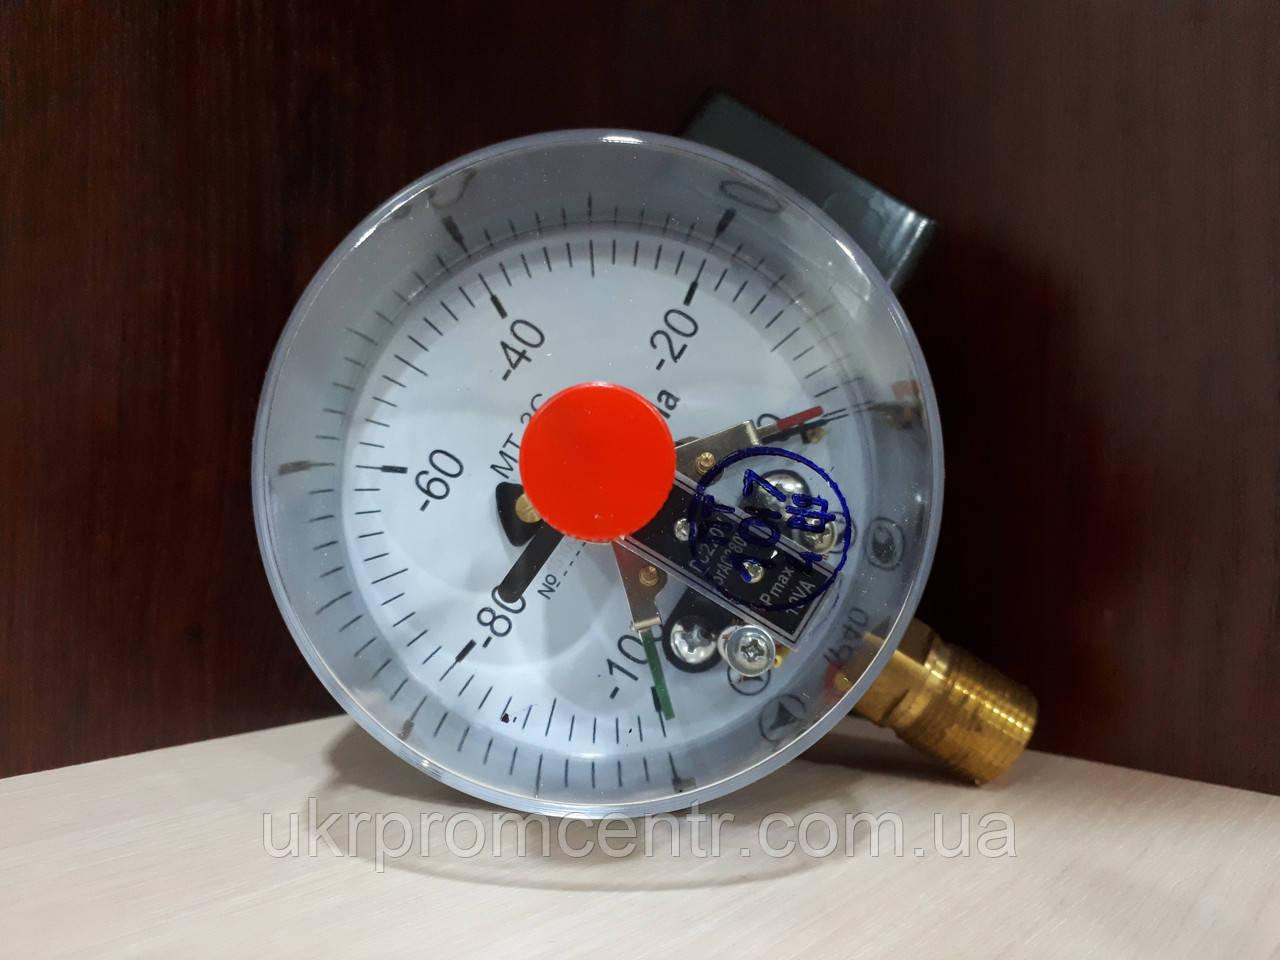 Вакуумметр электроконтактный МТ-3С